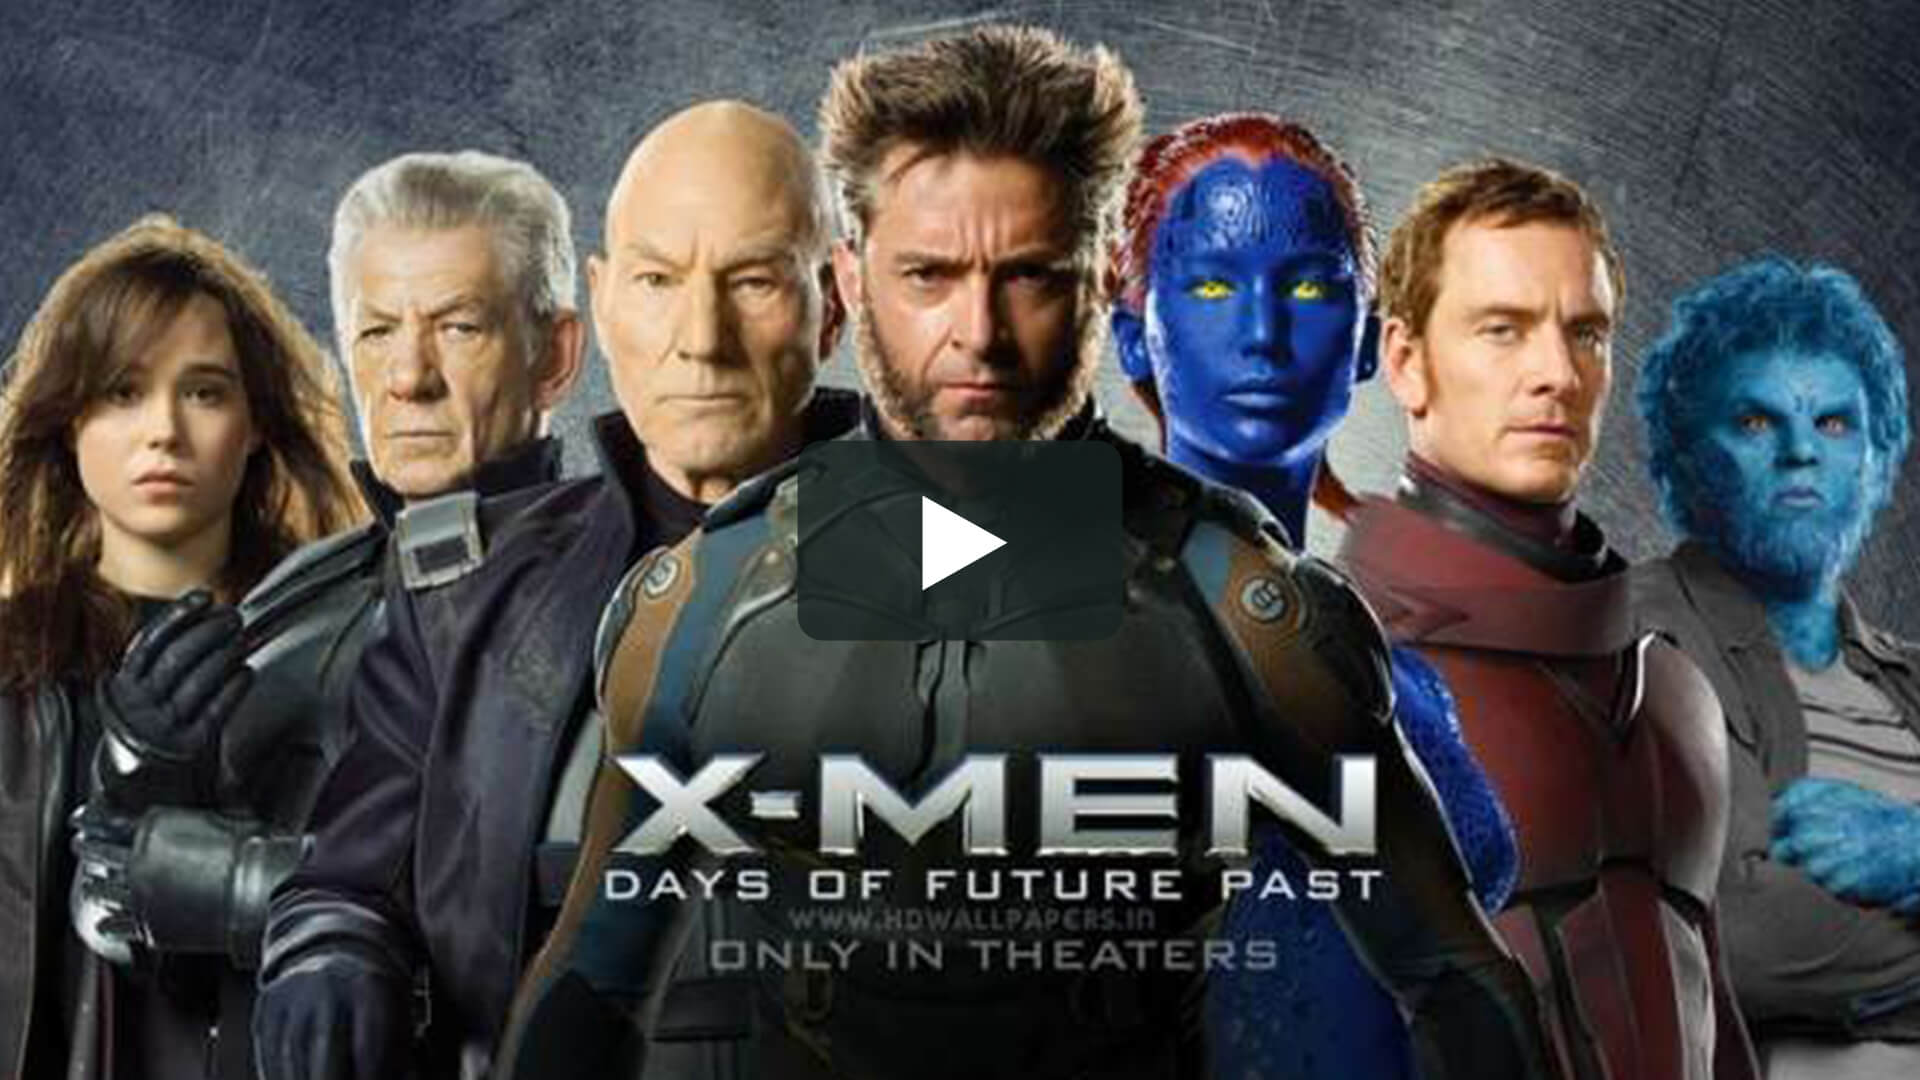 X-Men: Days of Future Past - X戰警:逆轉未來